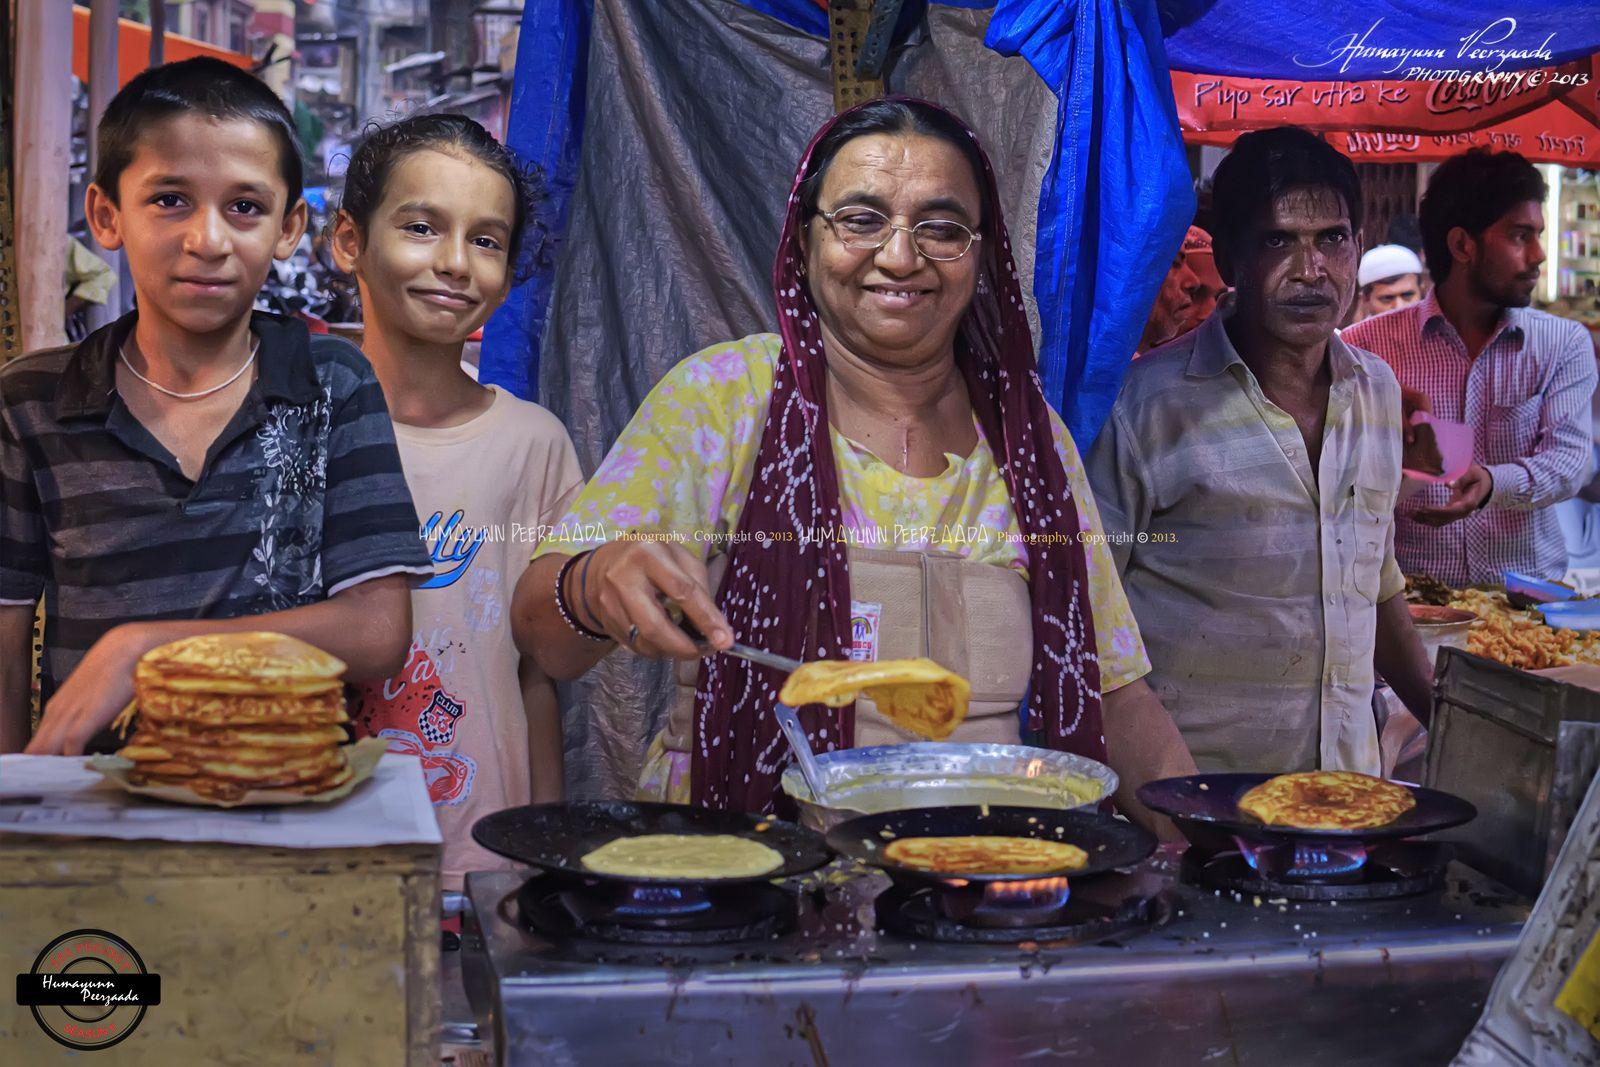 Bhandoli (pancake), Zubeidaa's Bai Stall,  just past Chinese 'n' Grill, IM Road, Foodlane, Mohd Ali Road, Mumbai, Maharashtra - India | by Humayunn Niaz Ahmed Peerzaada